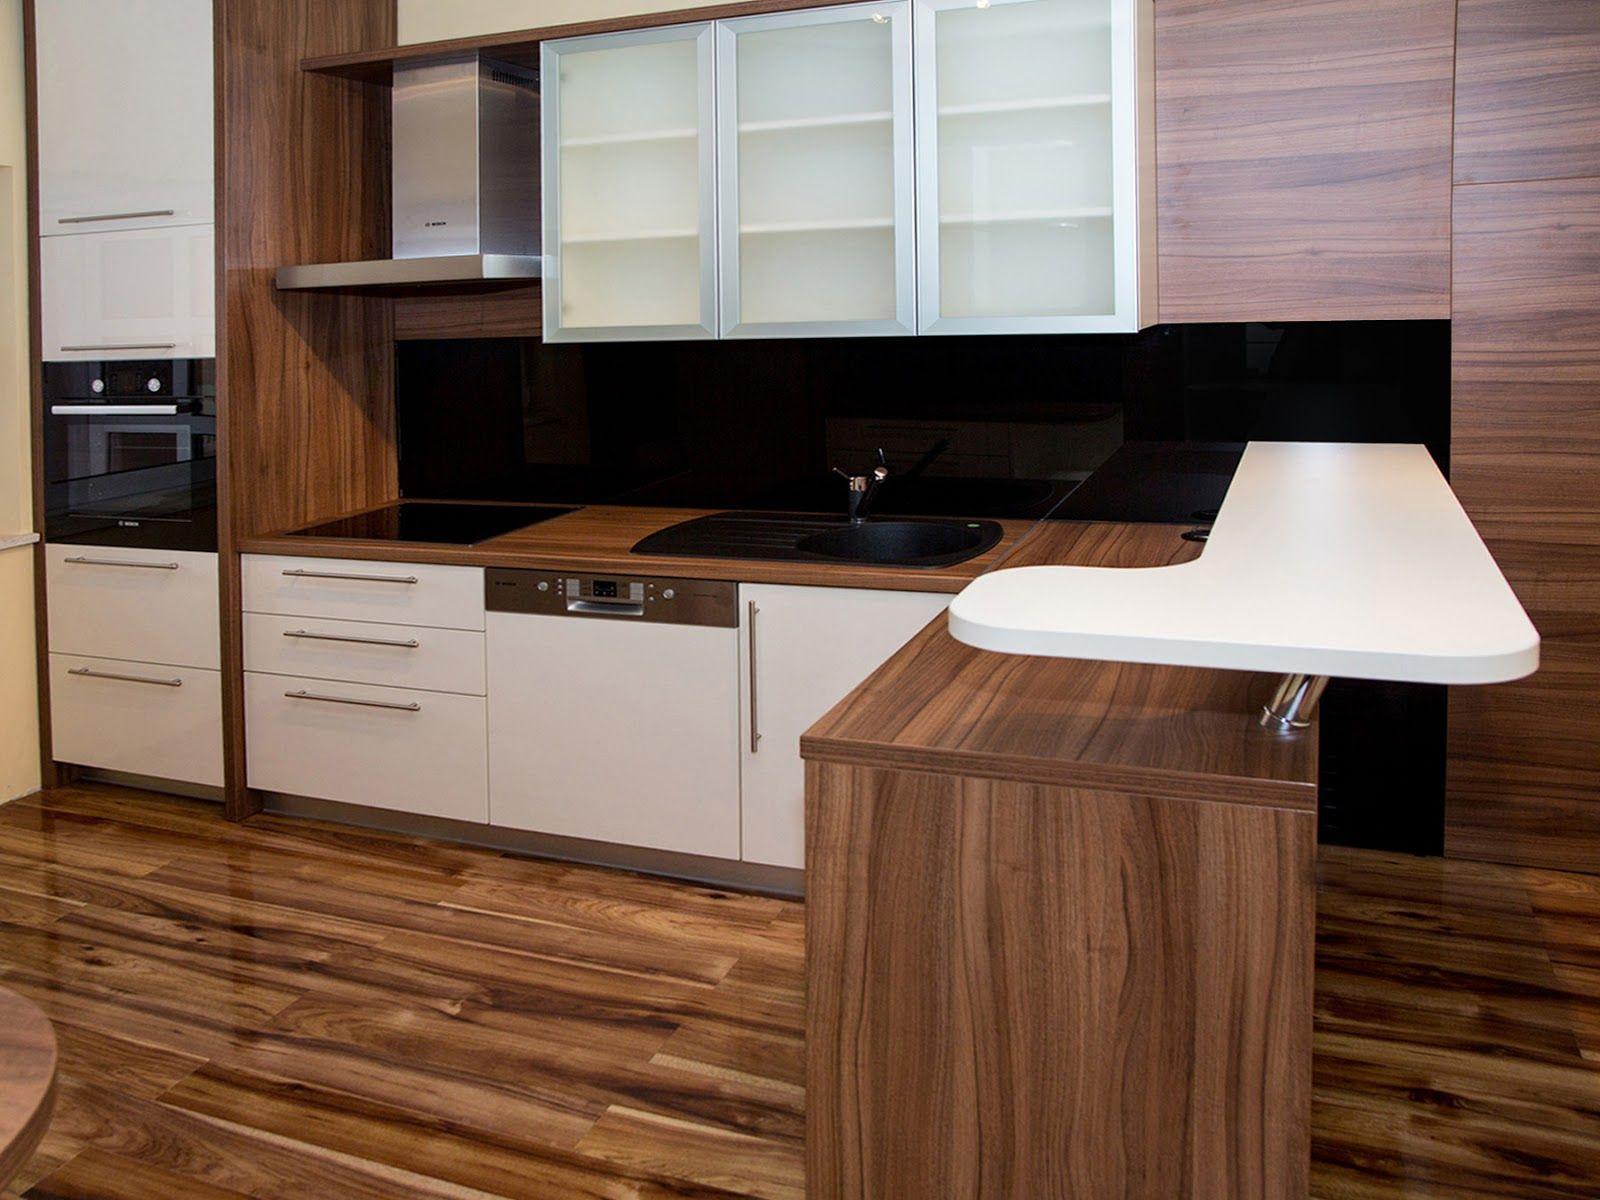 Floor Home Decor Kitchen Small Kitchen Design Ikea